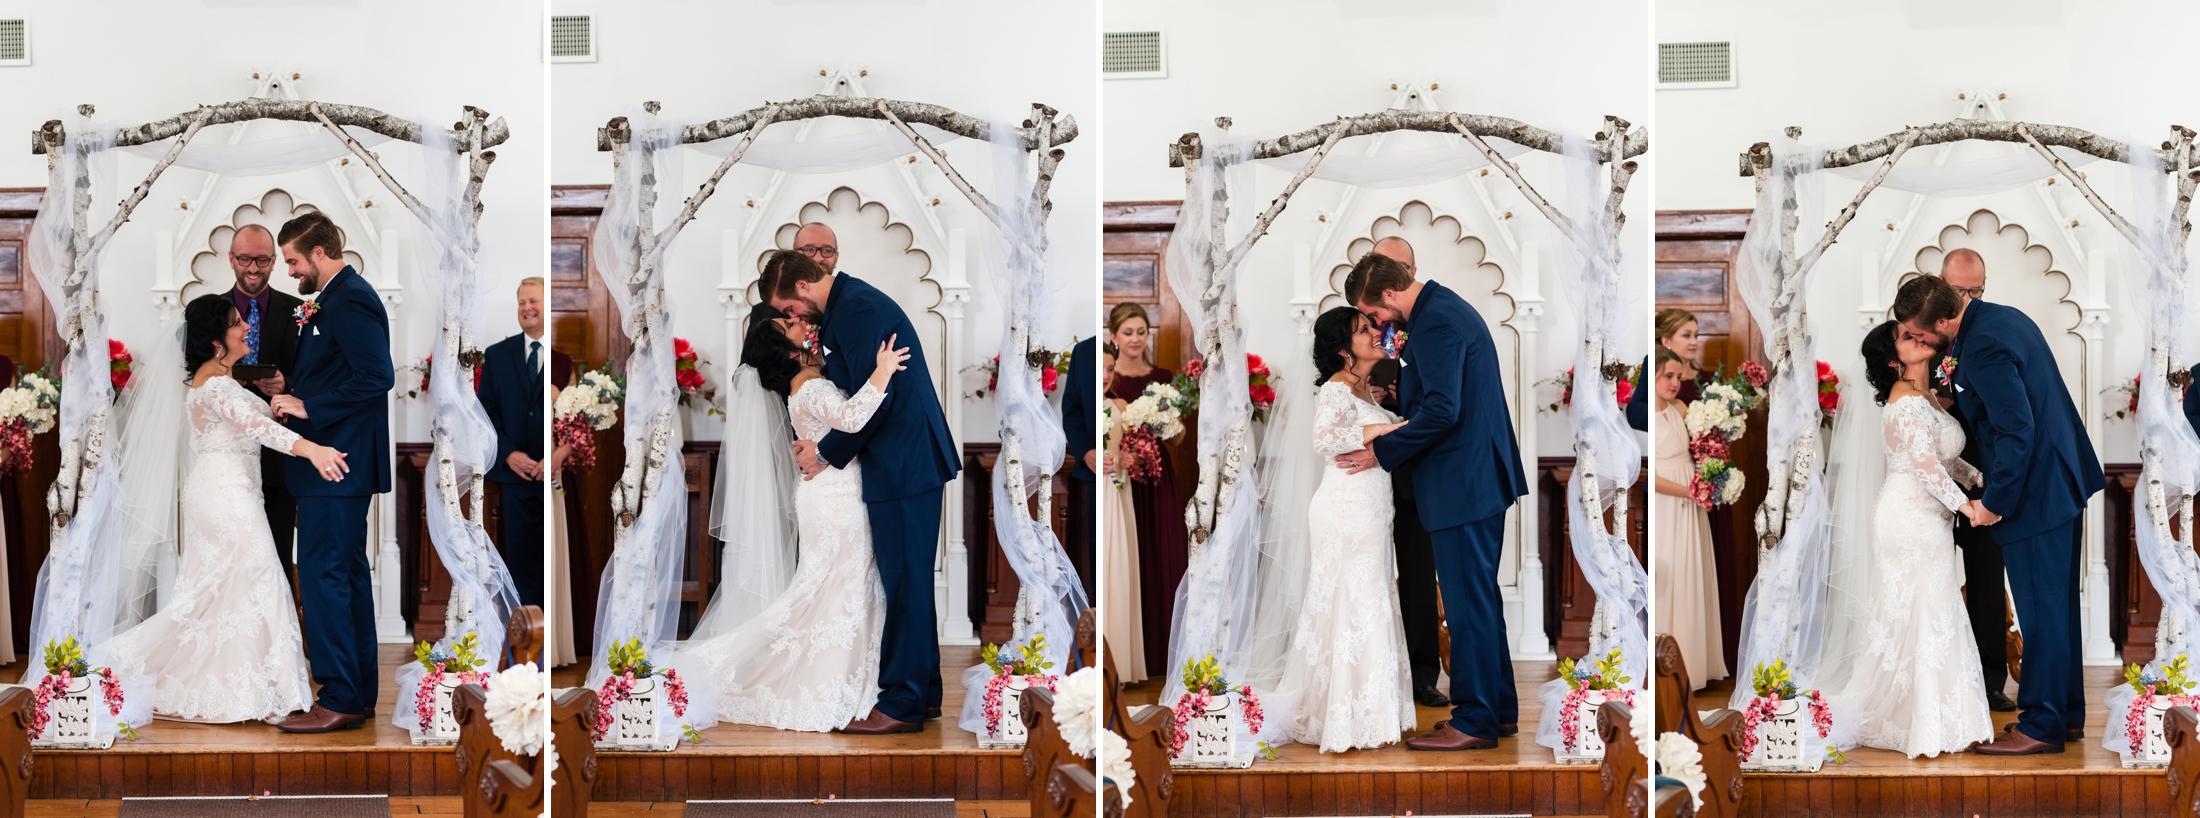 Best Wisconsin Wedding Photographer | Hortonville Opera House